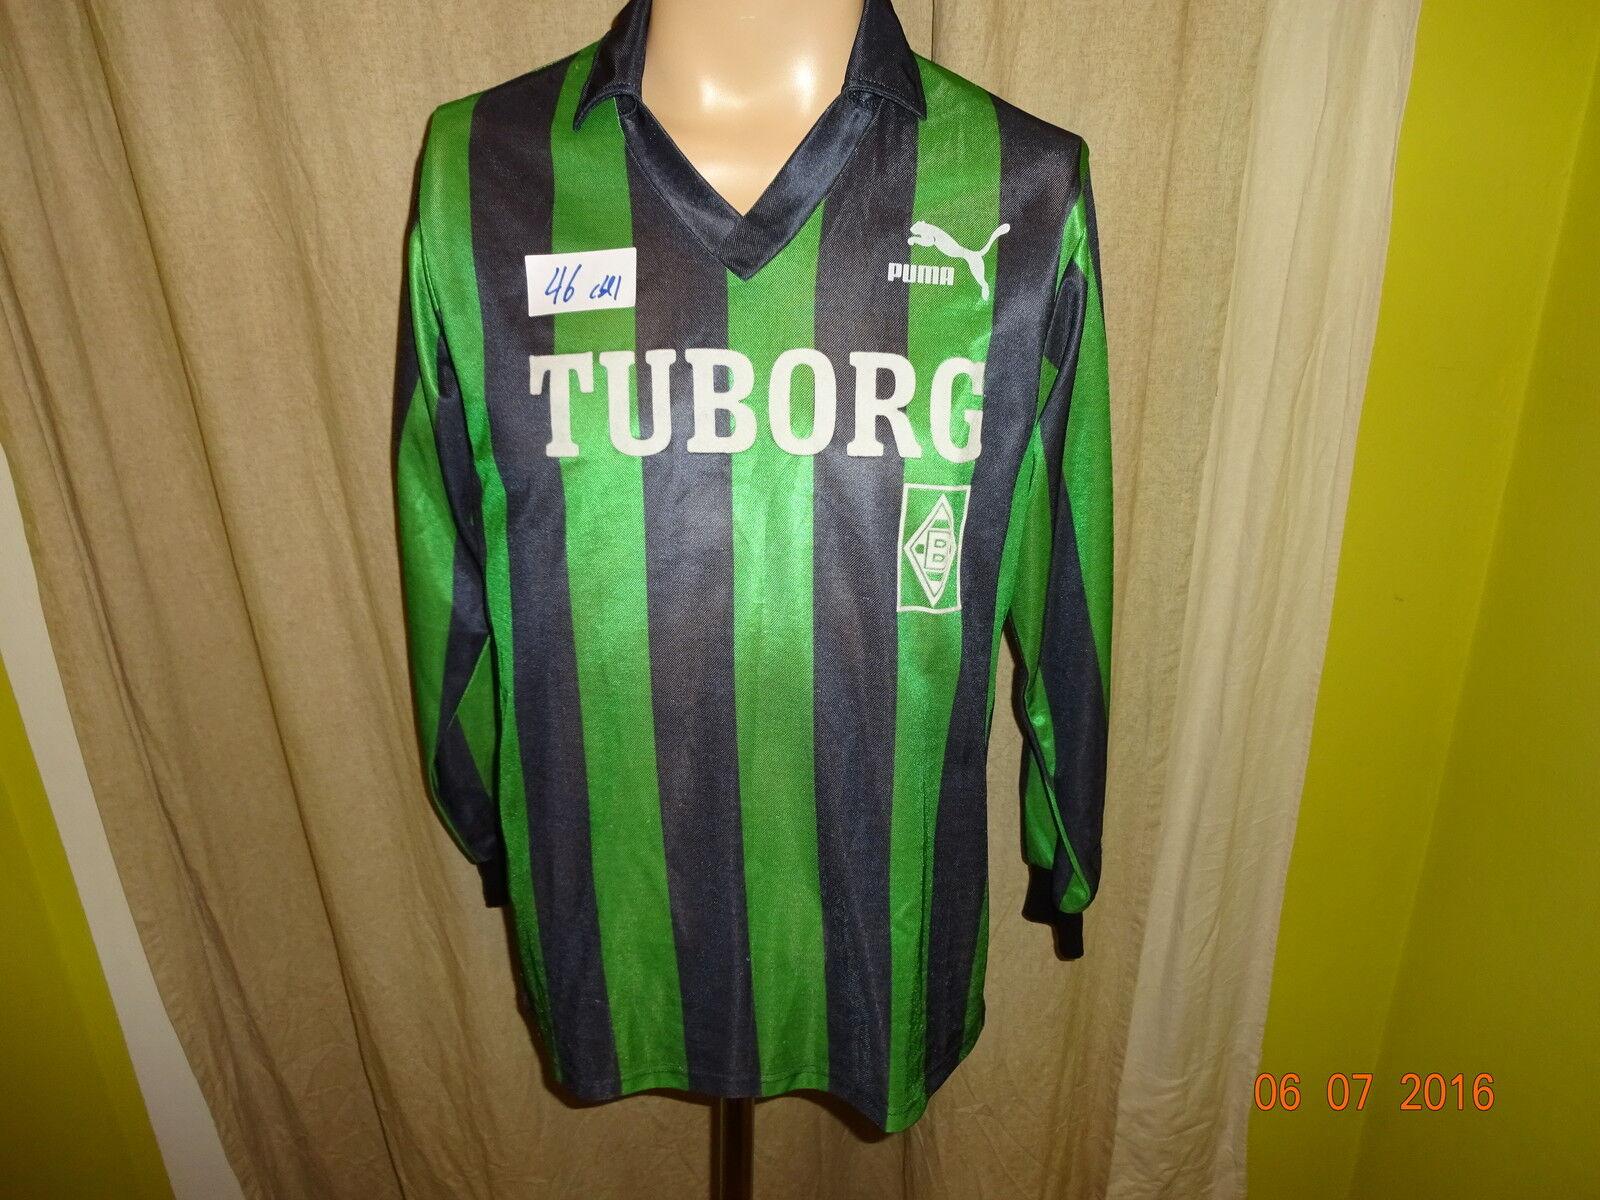 Borussia Mönchengladbach Original Puma Langarm Trikot 1991 92  TUBORG TUBORG TUBORG  Gr.S 8e8d9e